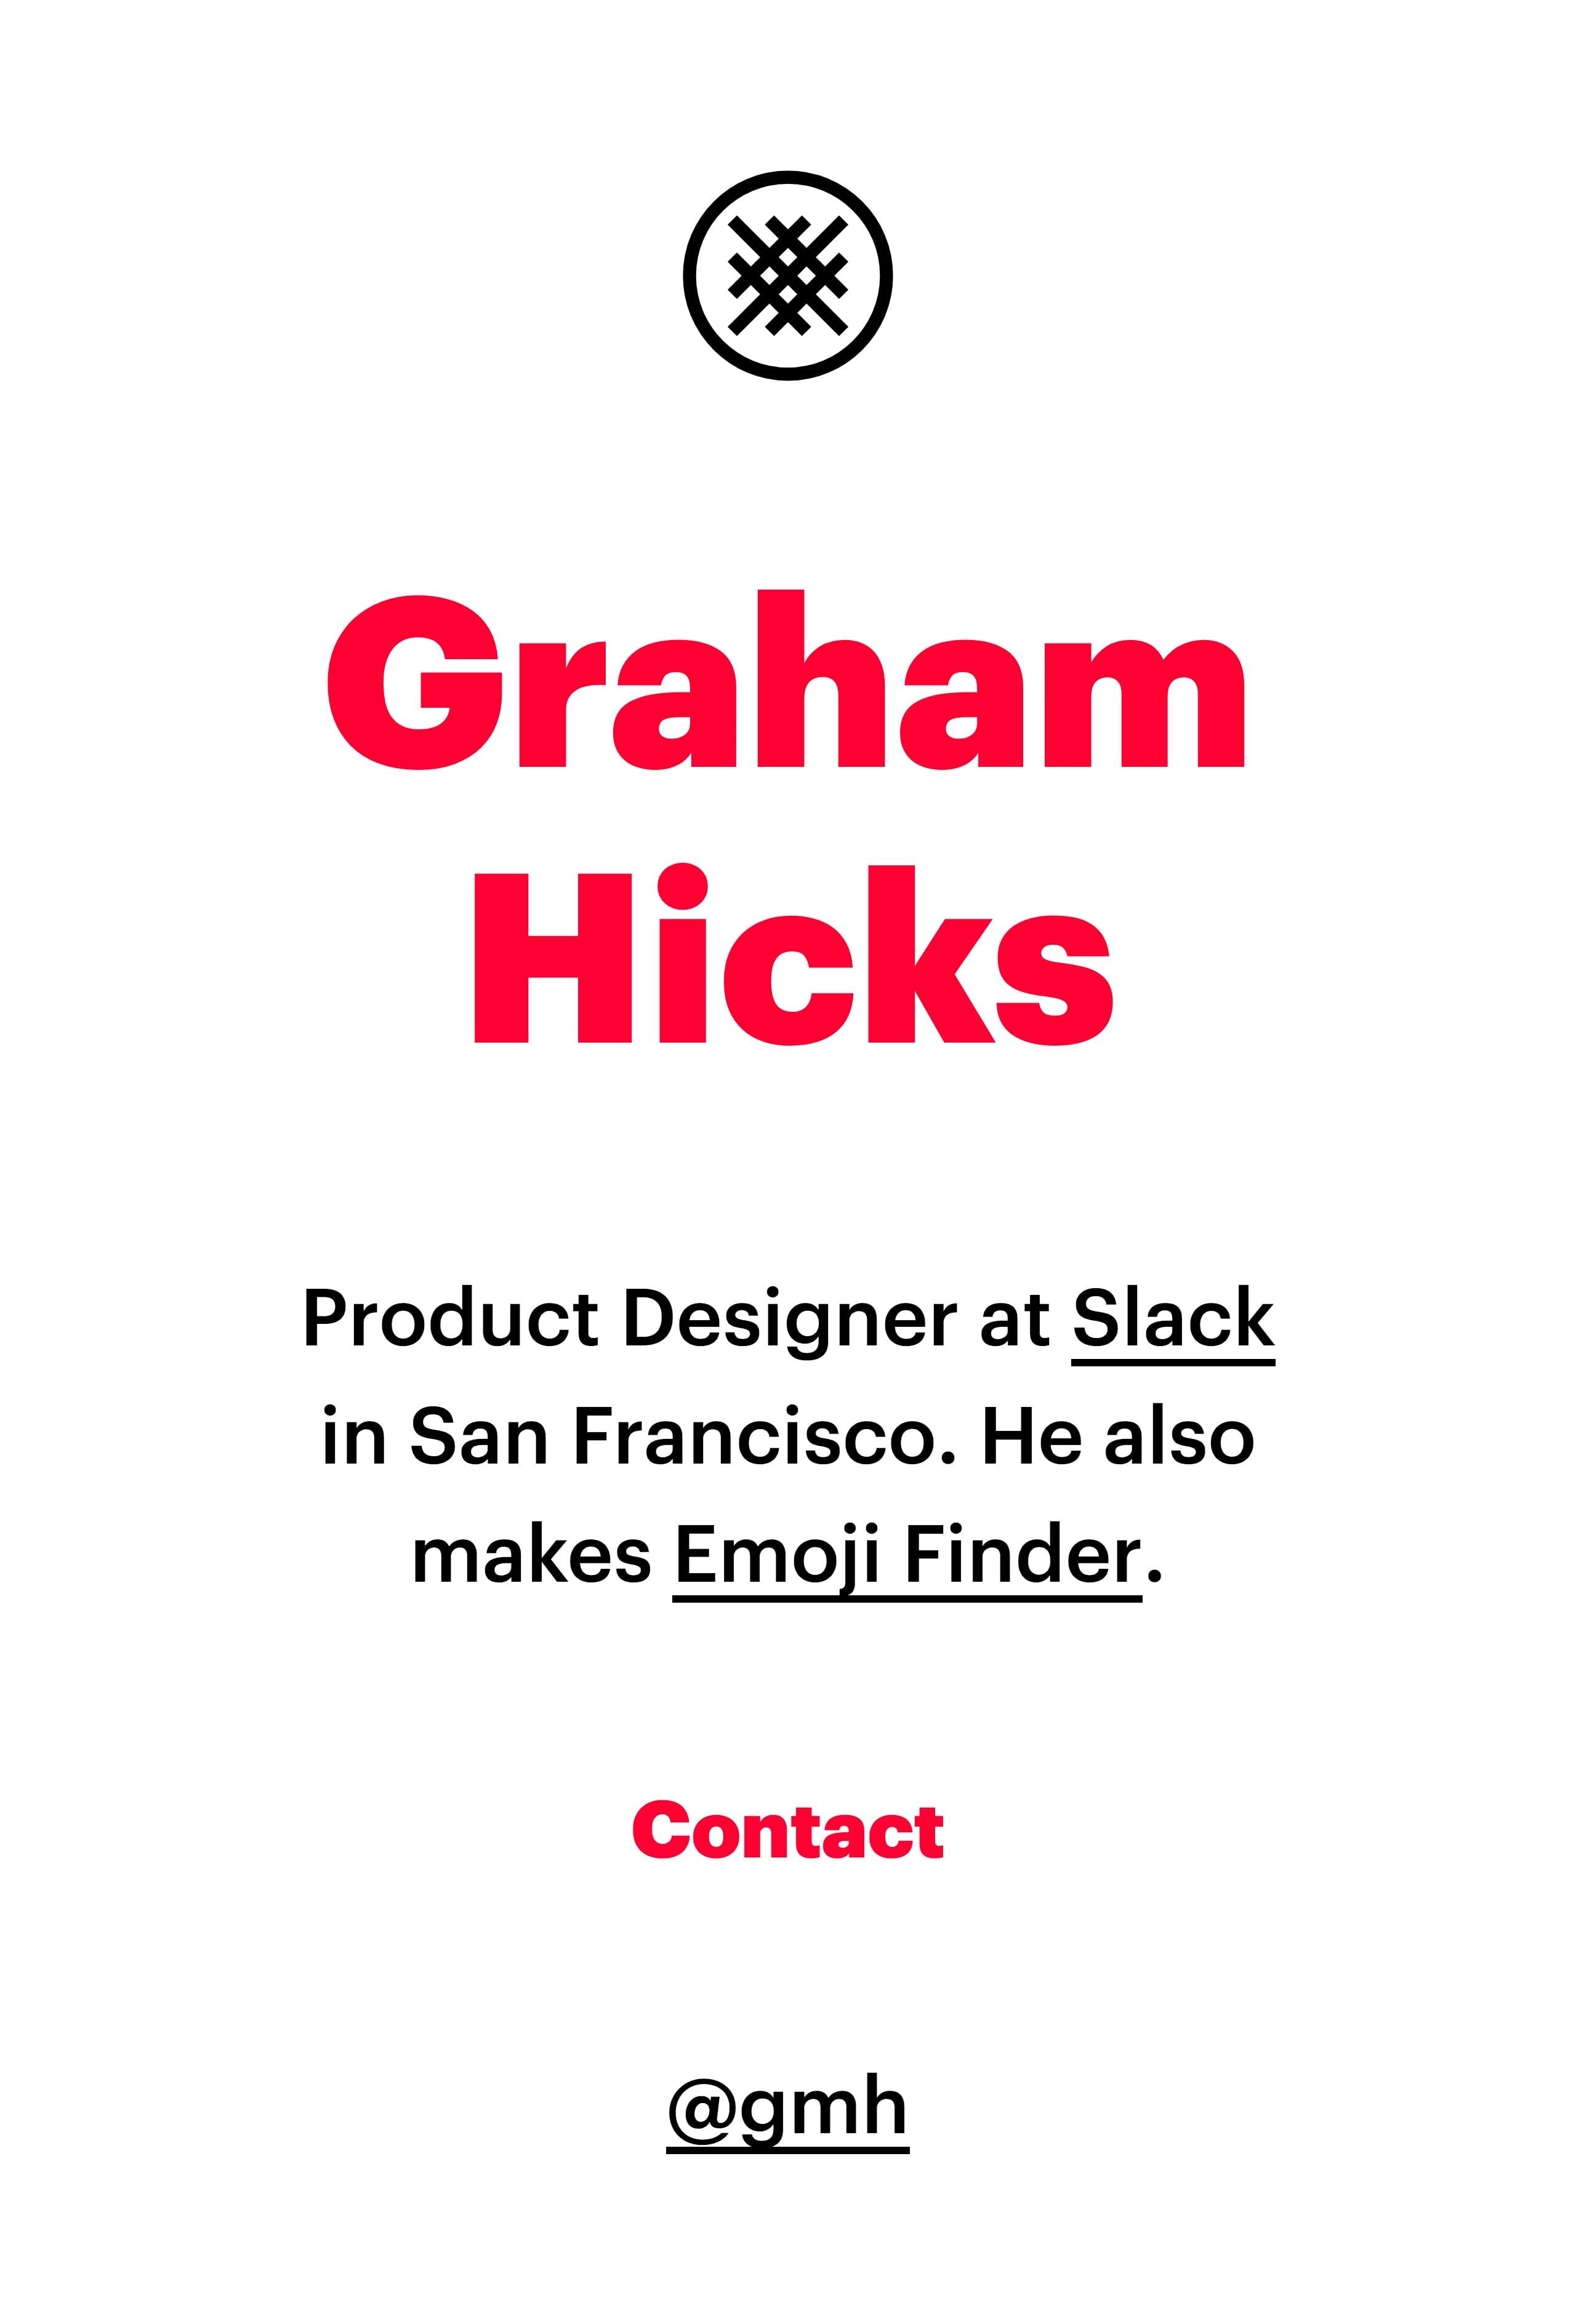 Graham Hicks Website Screenshot